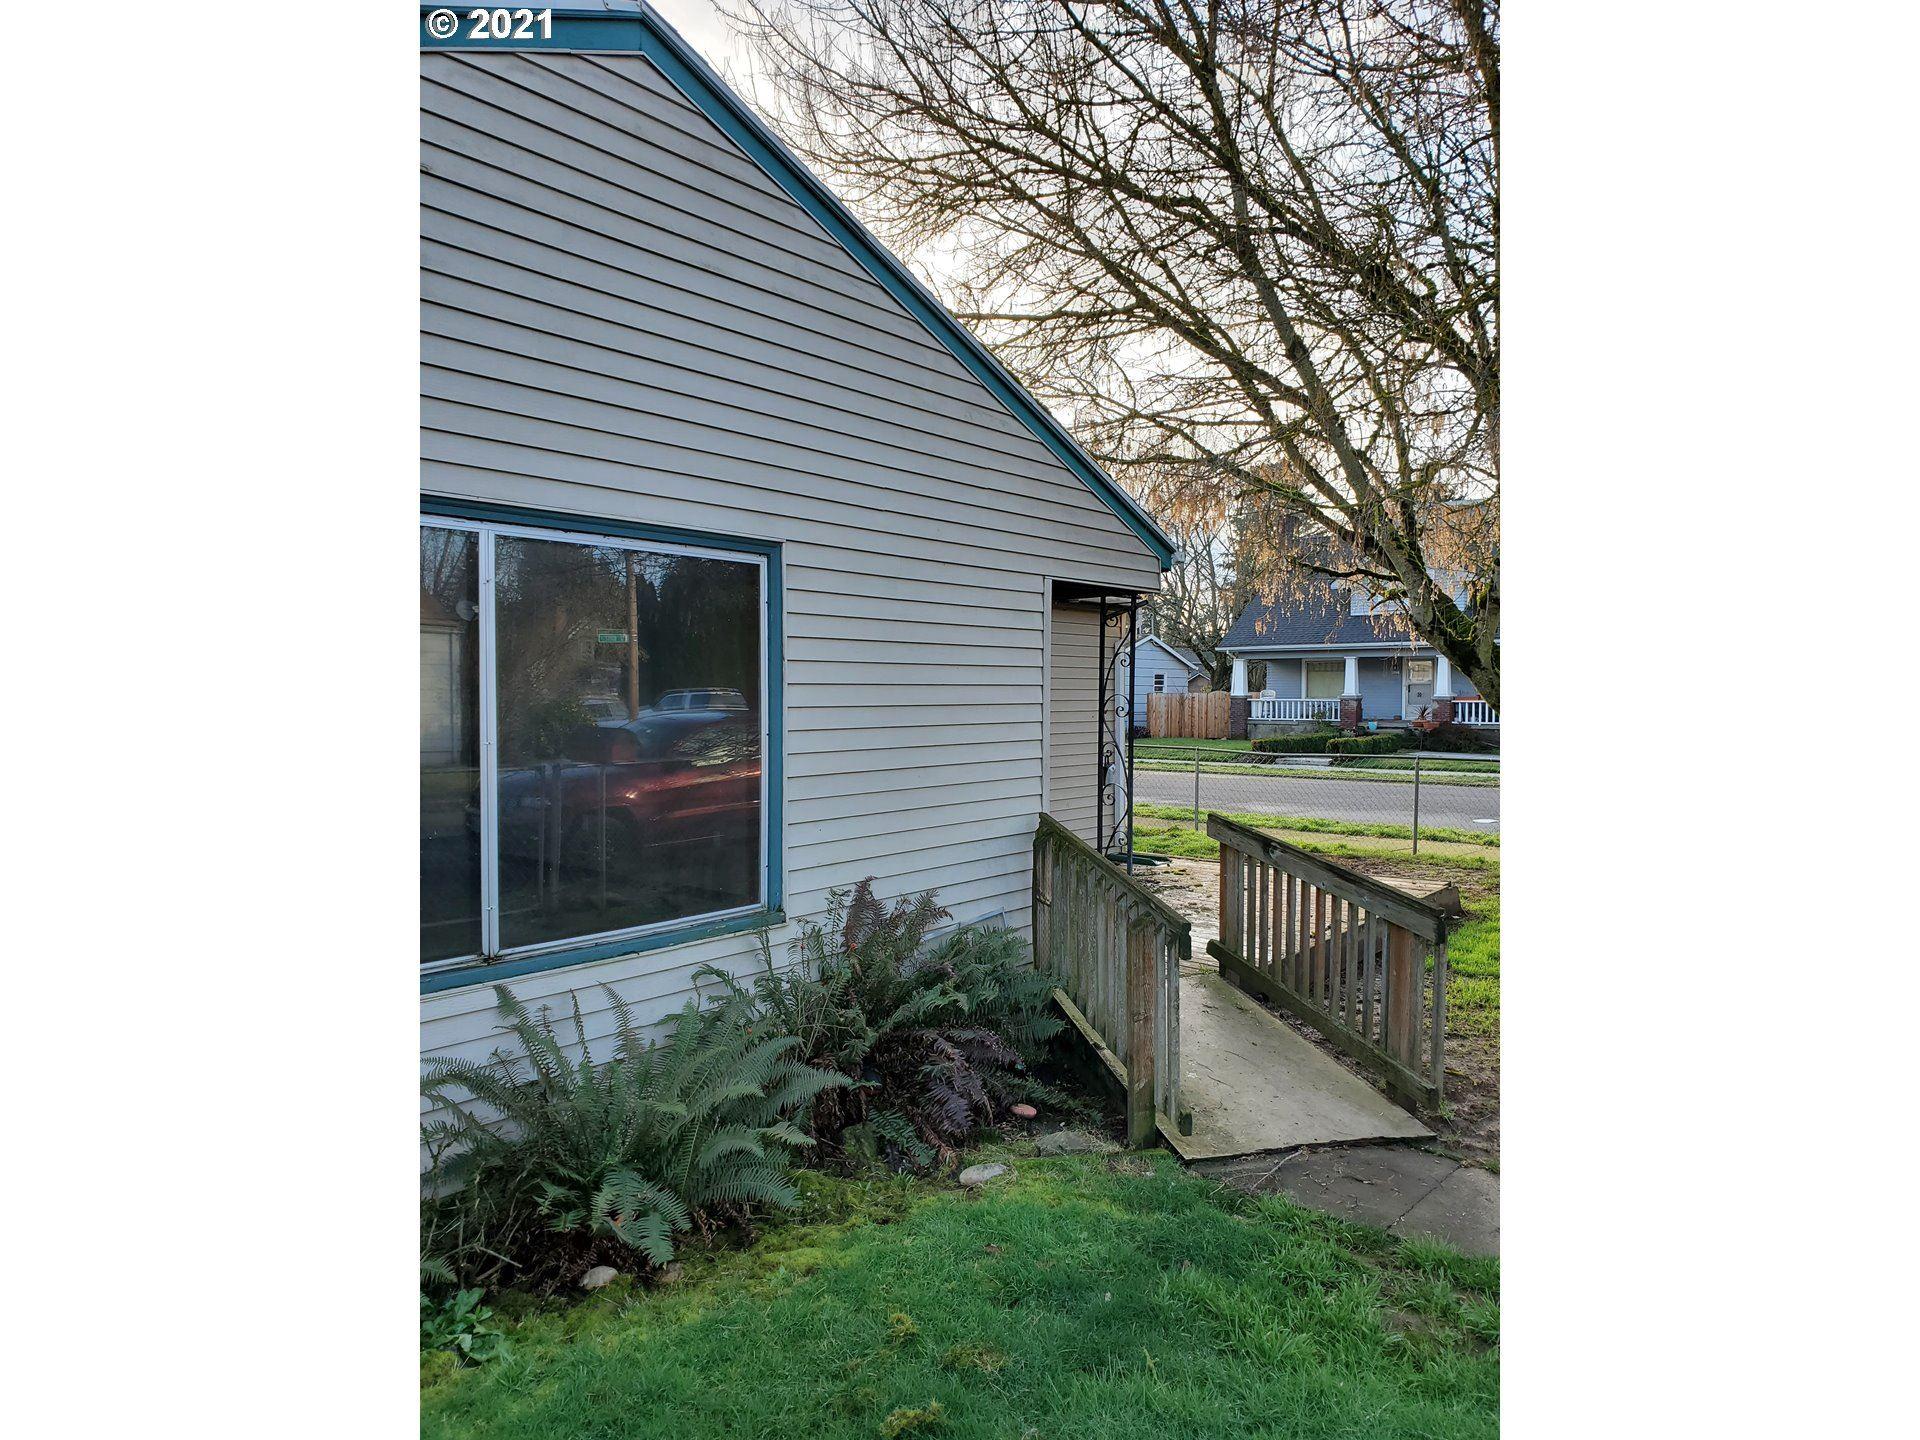 8008 SE BOISE ST, Portland, OR 97206 - MLS#: 20502388